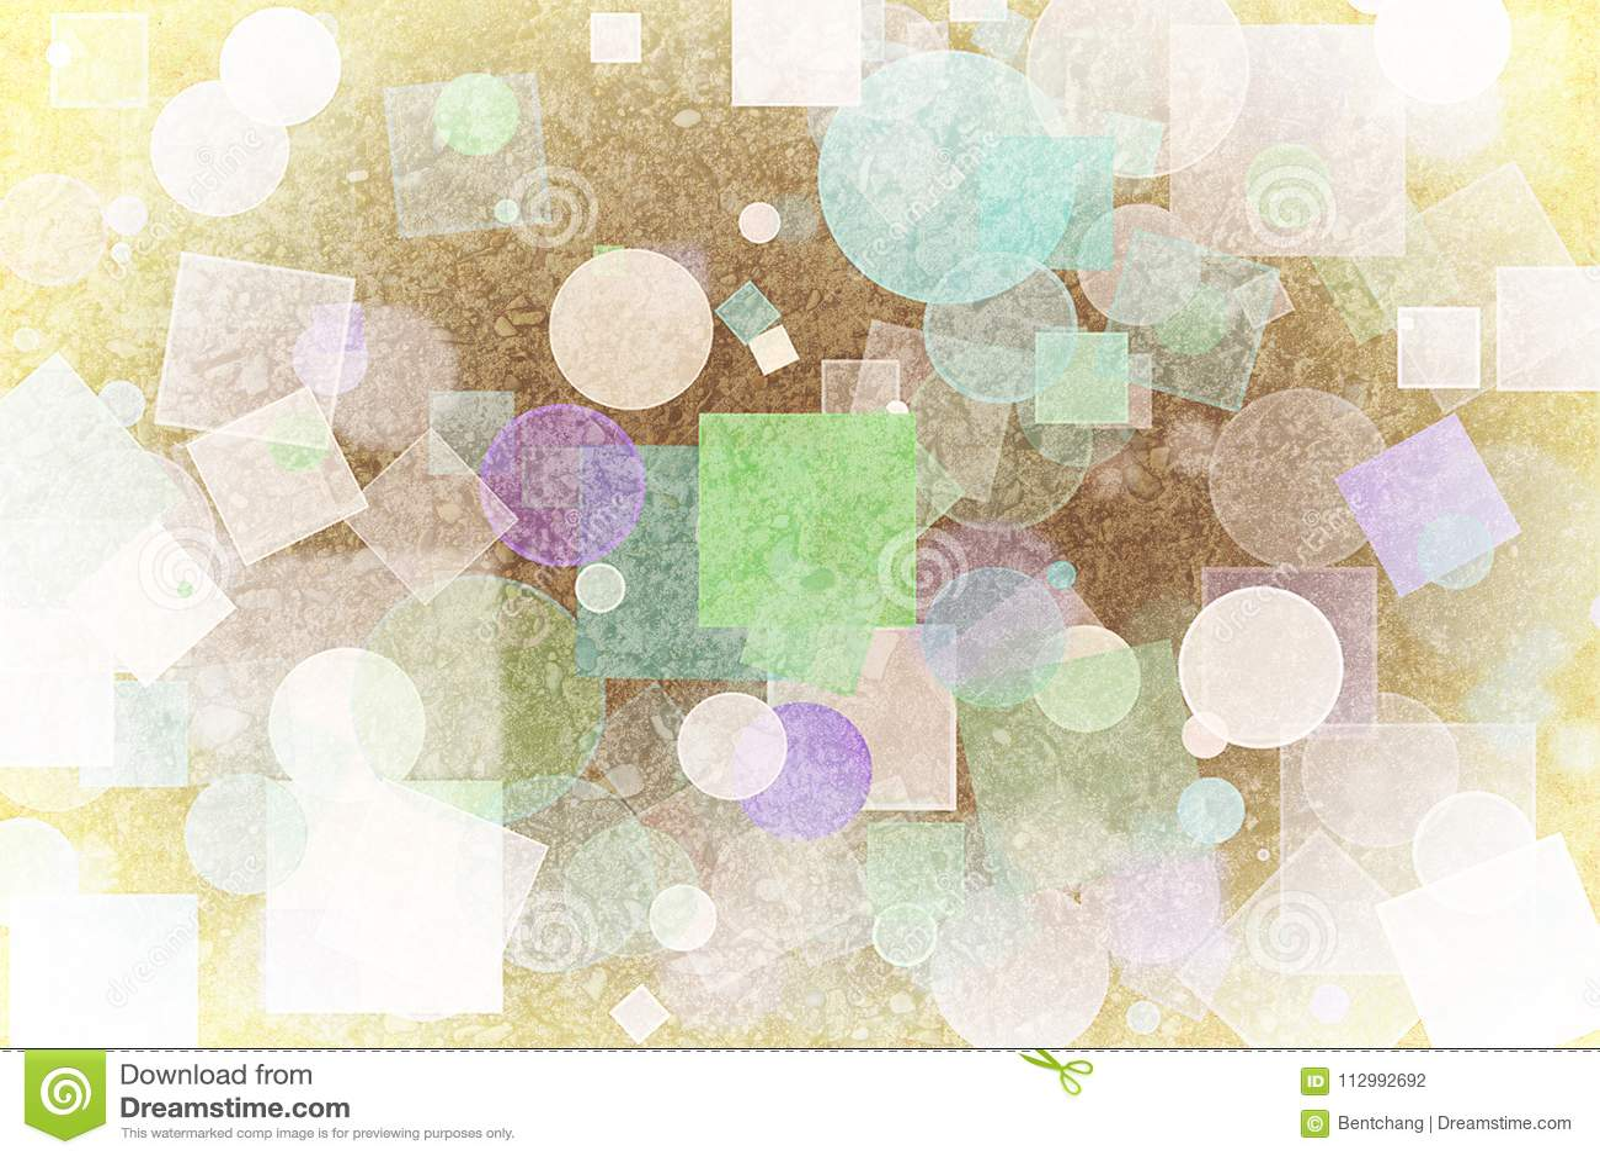 Abstract shape generative design art background. Pattern, backdrop, rectangle, digital & fashion.